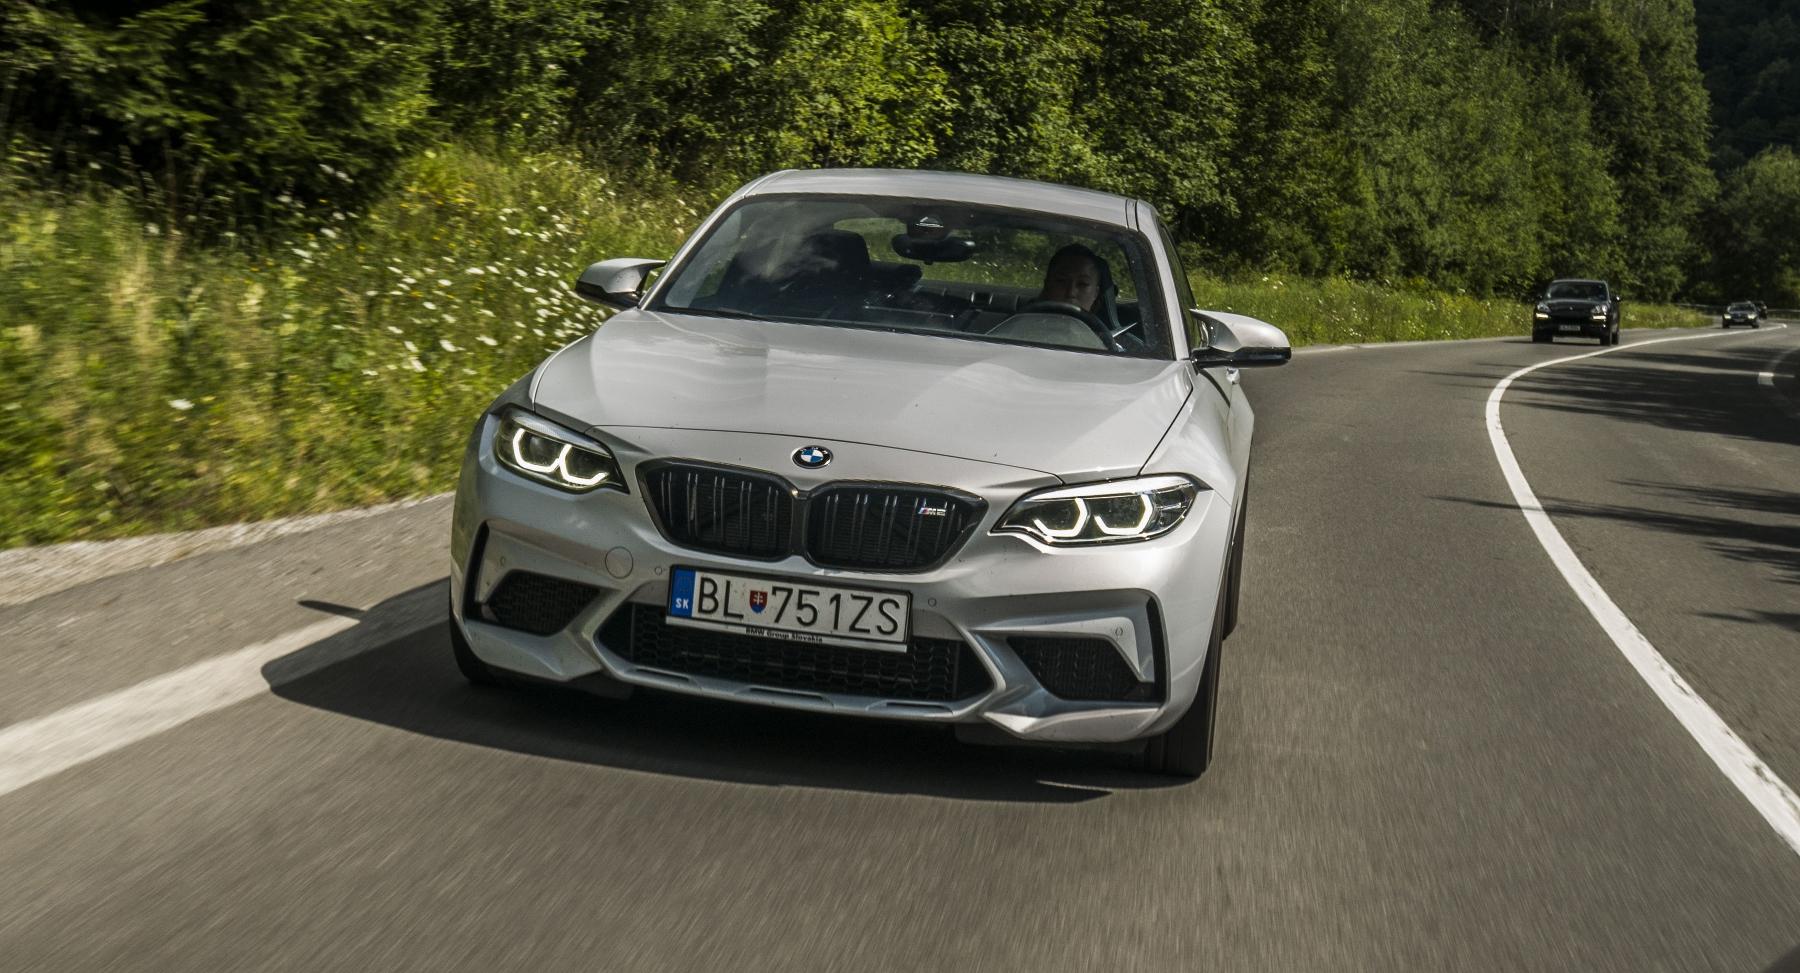 Test: BMW M2 Competition je nálož plná zábavy 4oj7zMZ39u bmw-m2-26